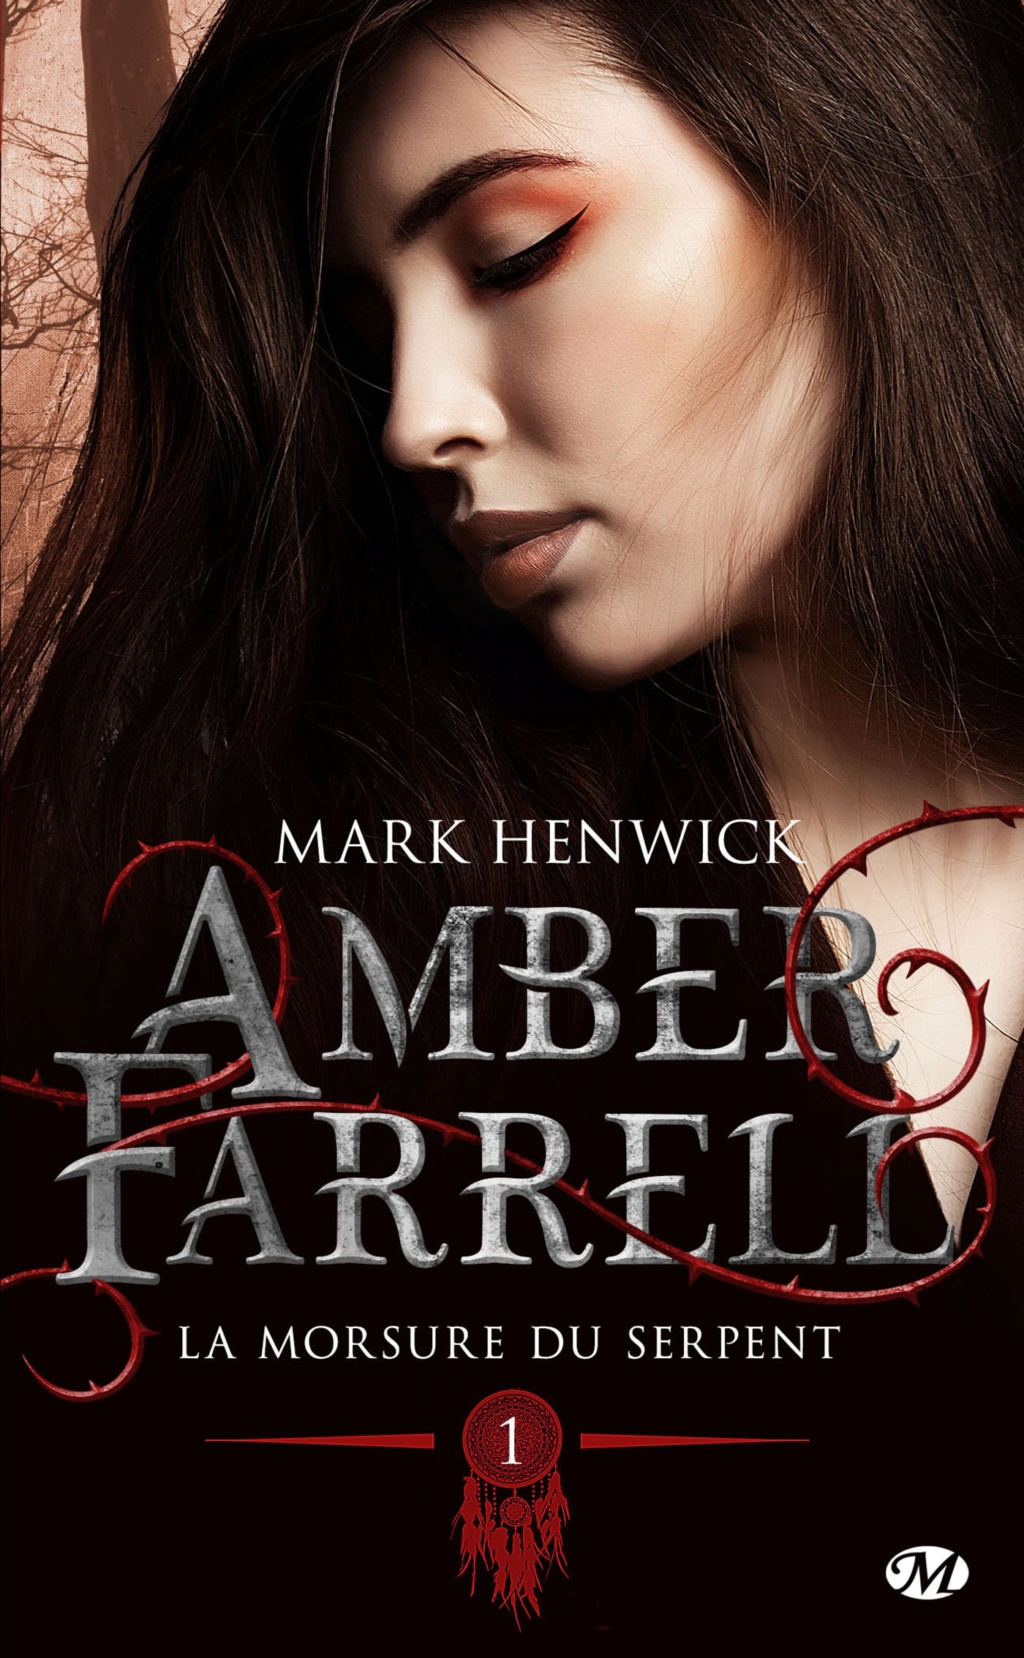 HENWICK Mark - AMBER FARRELL - Tome 1 : La morsure du serpent Amber-10